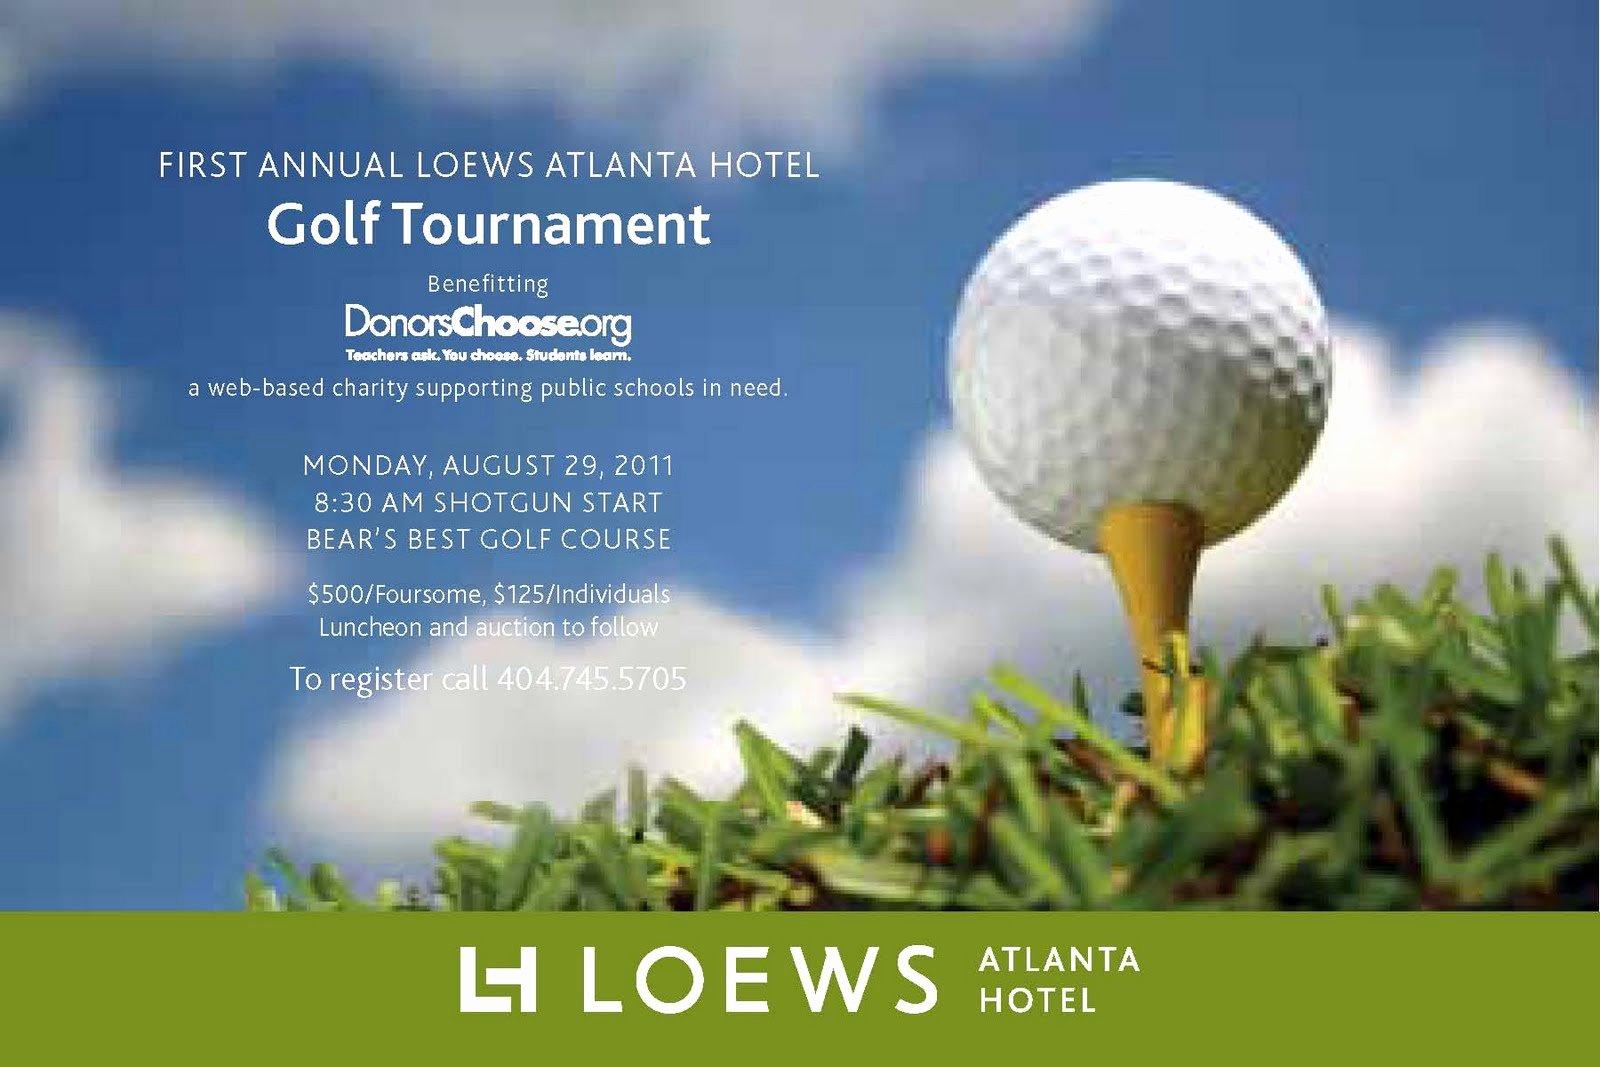 join loews atlanta hotel for their